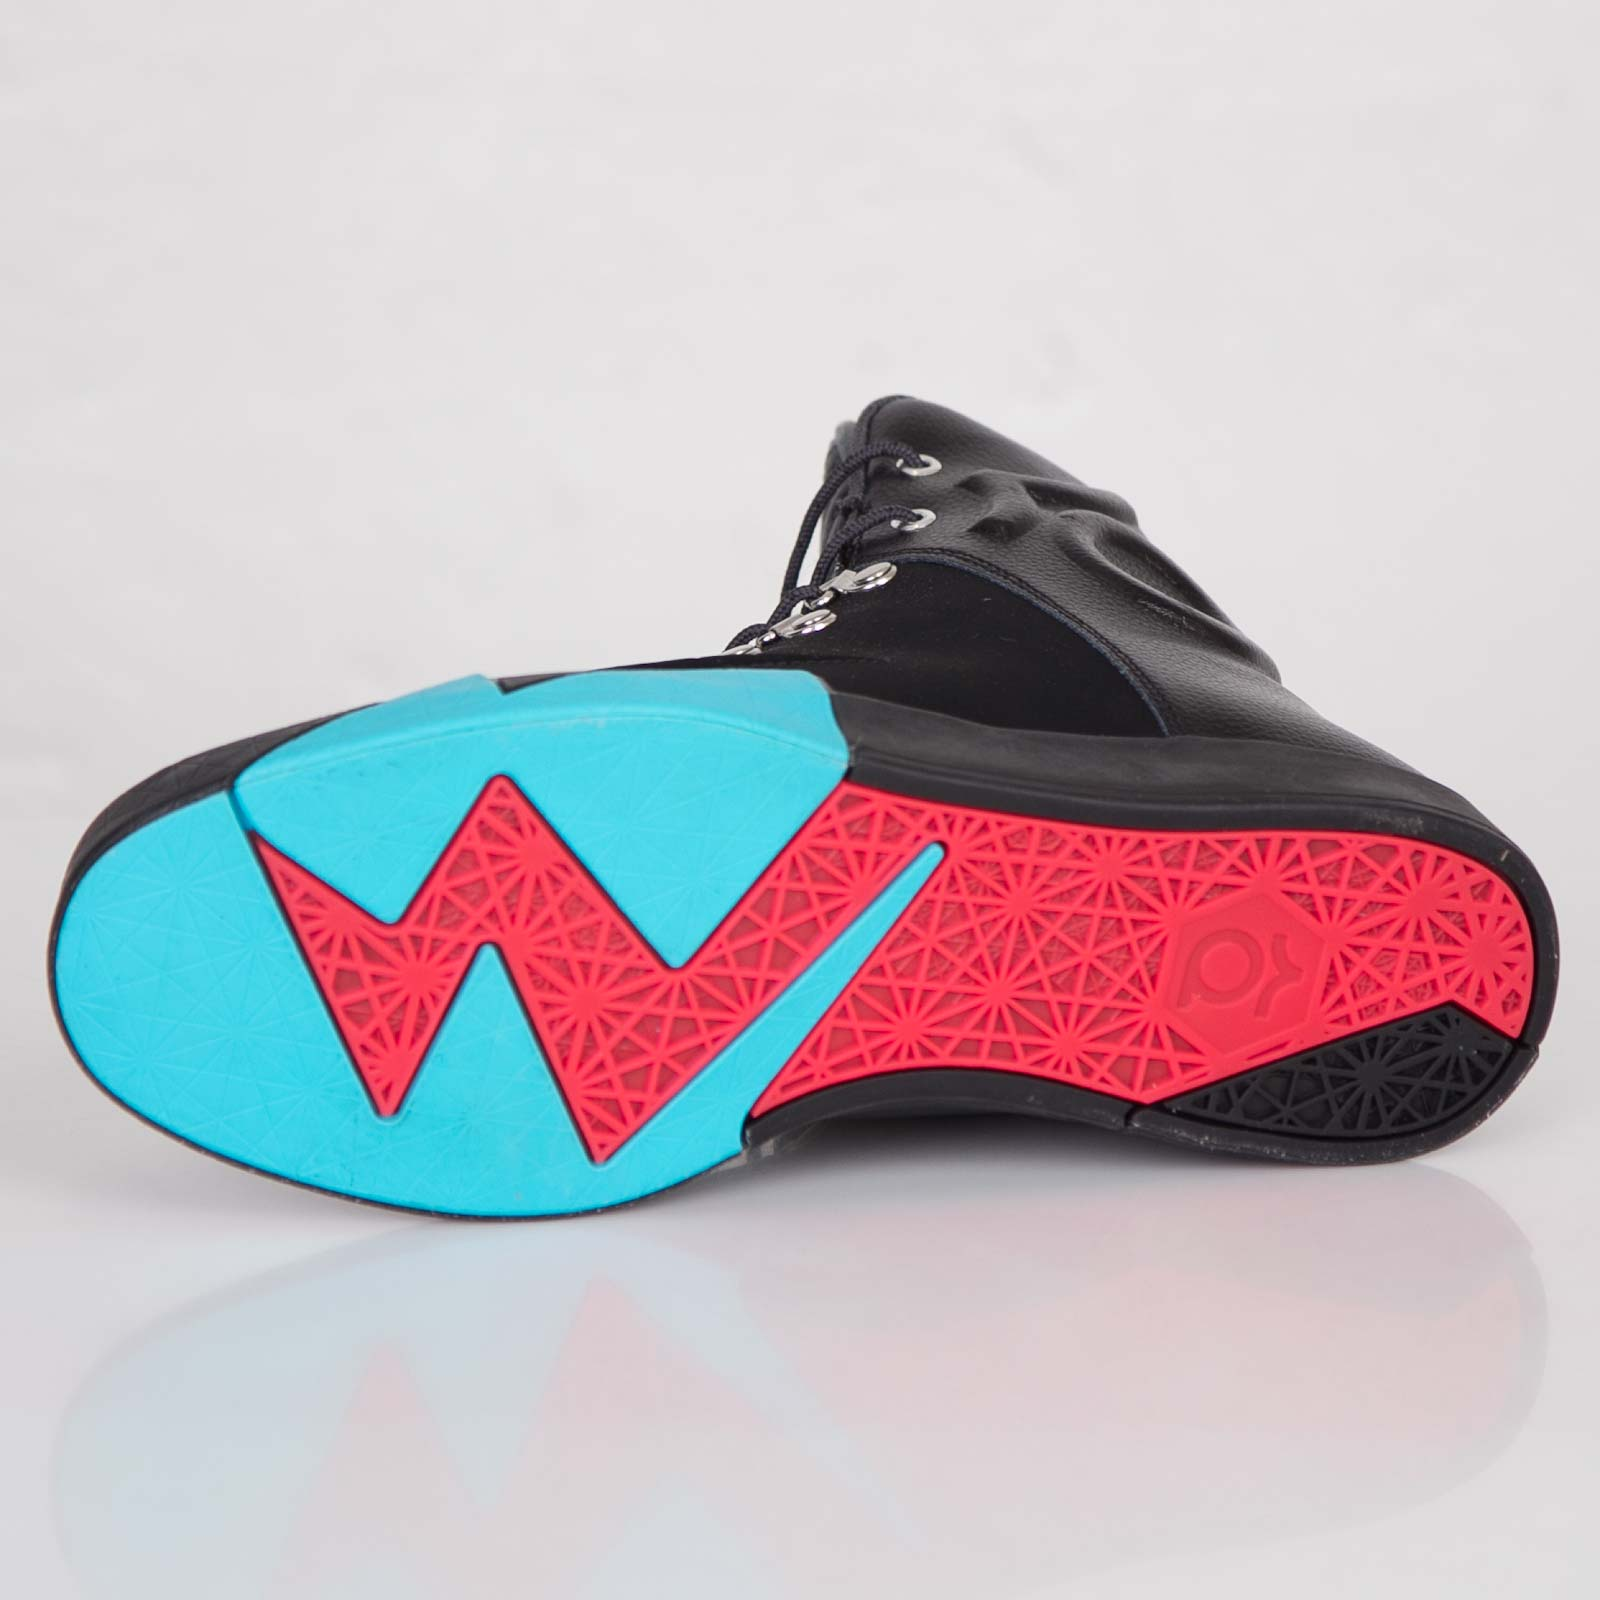 Nike KD VI NSW Lifestyle Leather QS 621945 001 Basketsnstuff